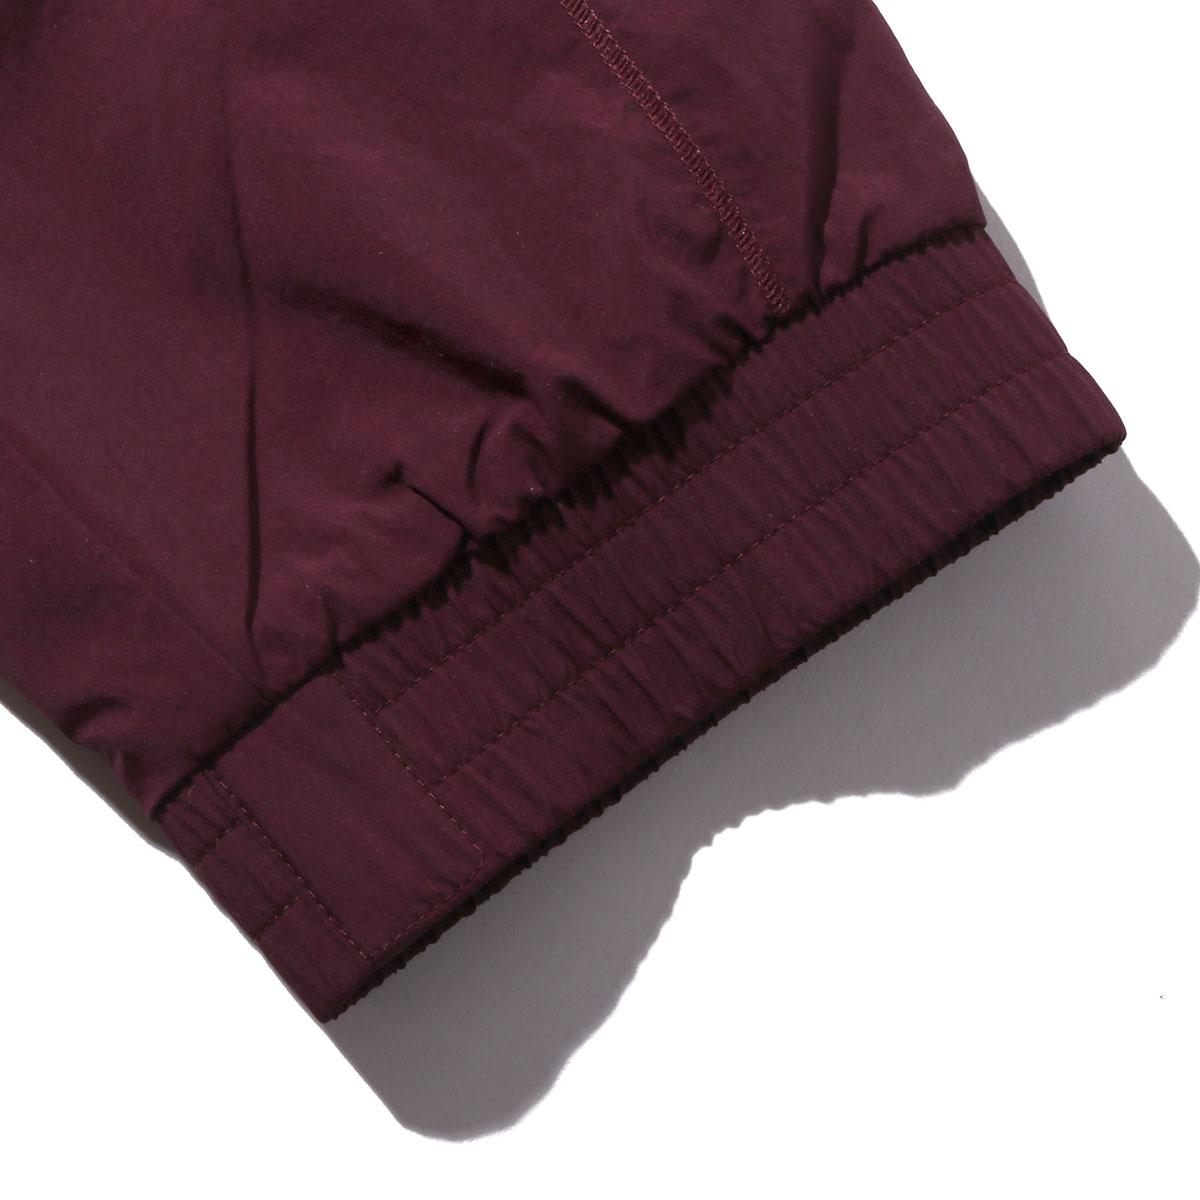 adidas Originals FLAMESTRIKE WOVEN TRACK PANTS (MAROON) (Adidas originals frame strike Woo BUND rack underwear)